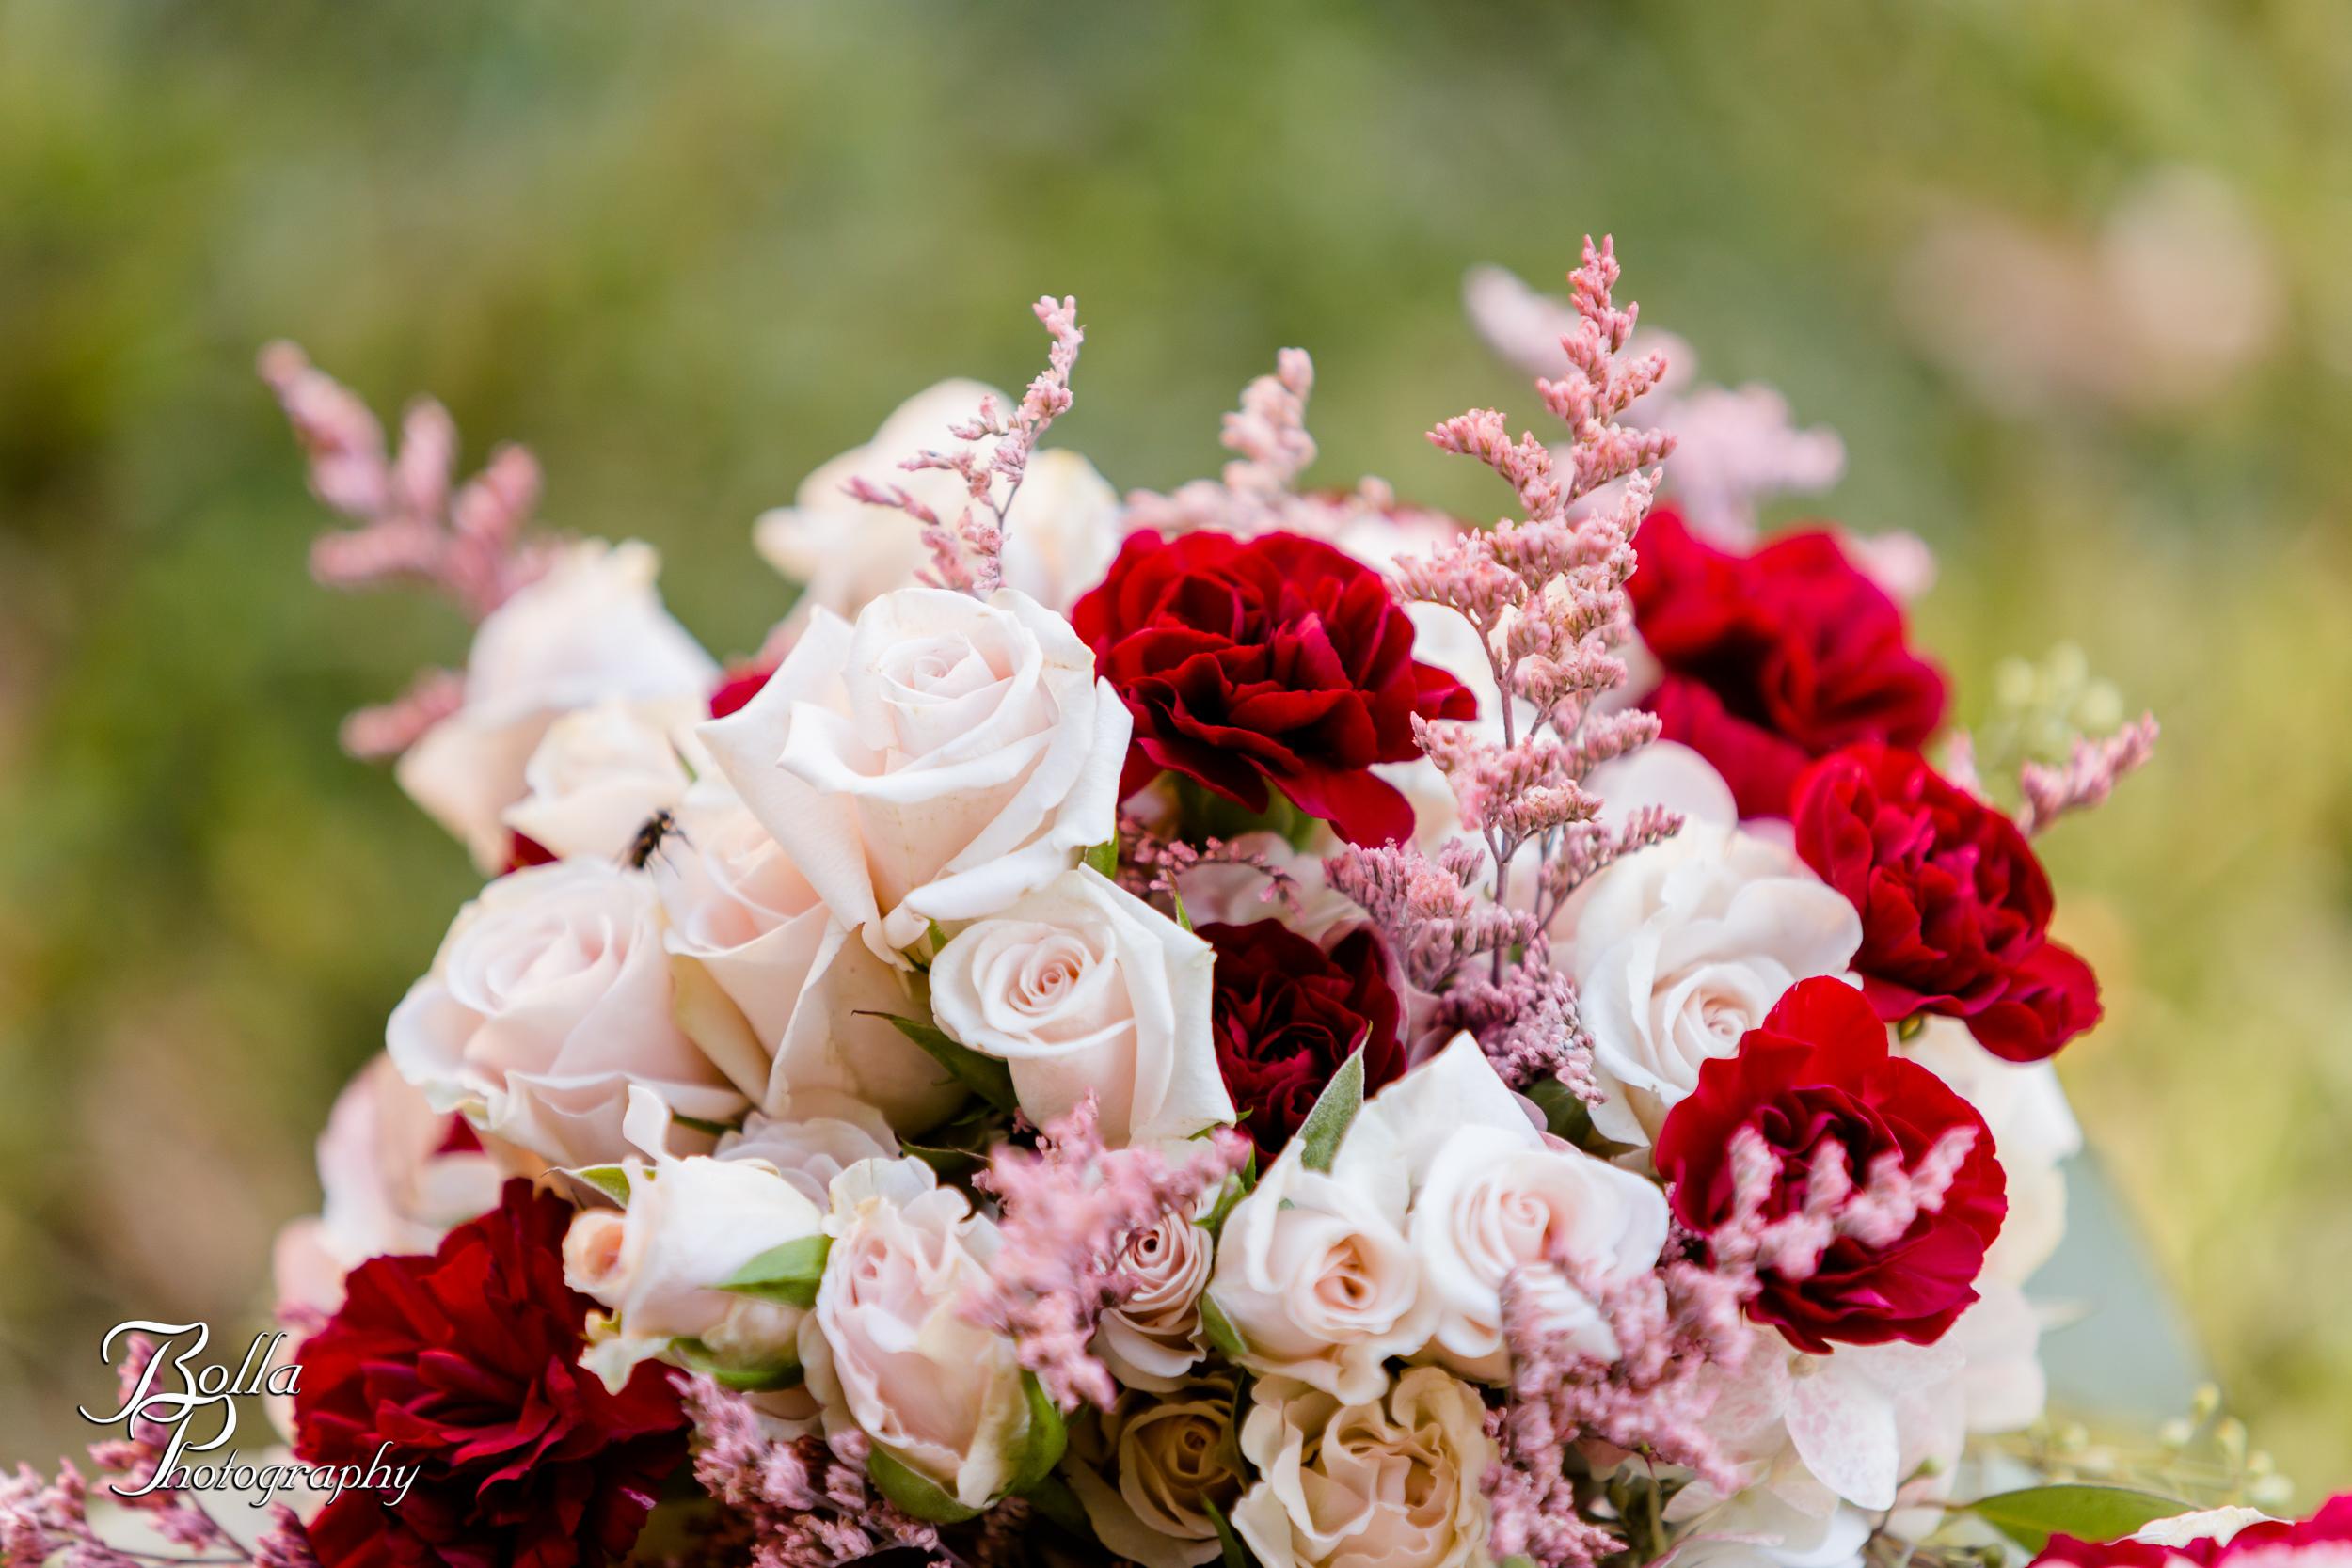 Bolla_photography_edwardsville_wedding_photographer_st_louis_weddings_Reilmann-0101.jpg